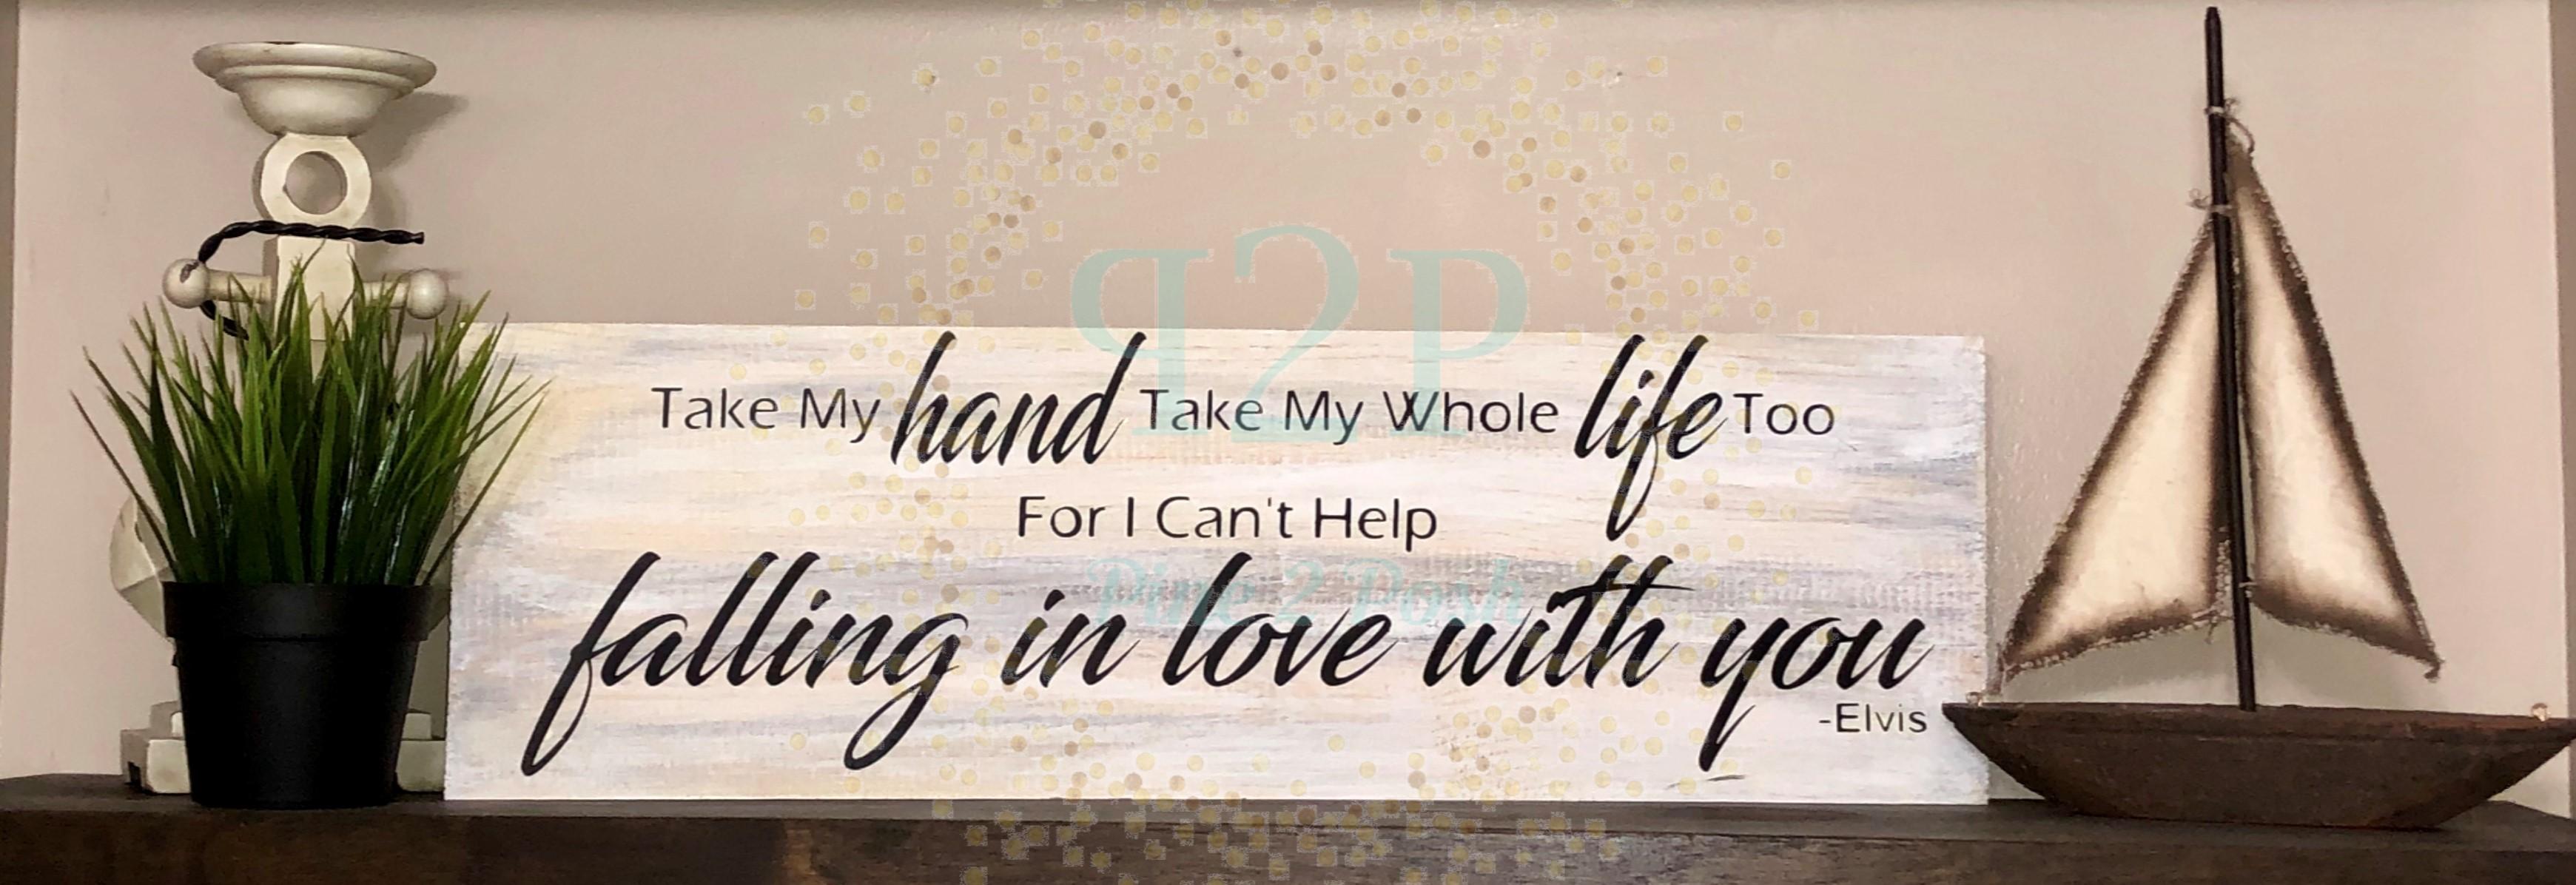 262 - Take My Hand